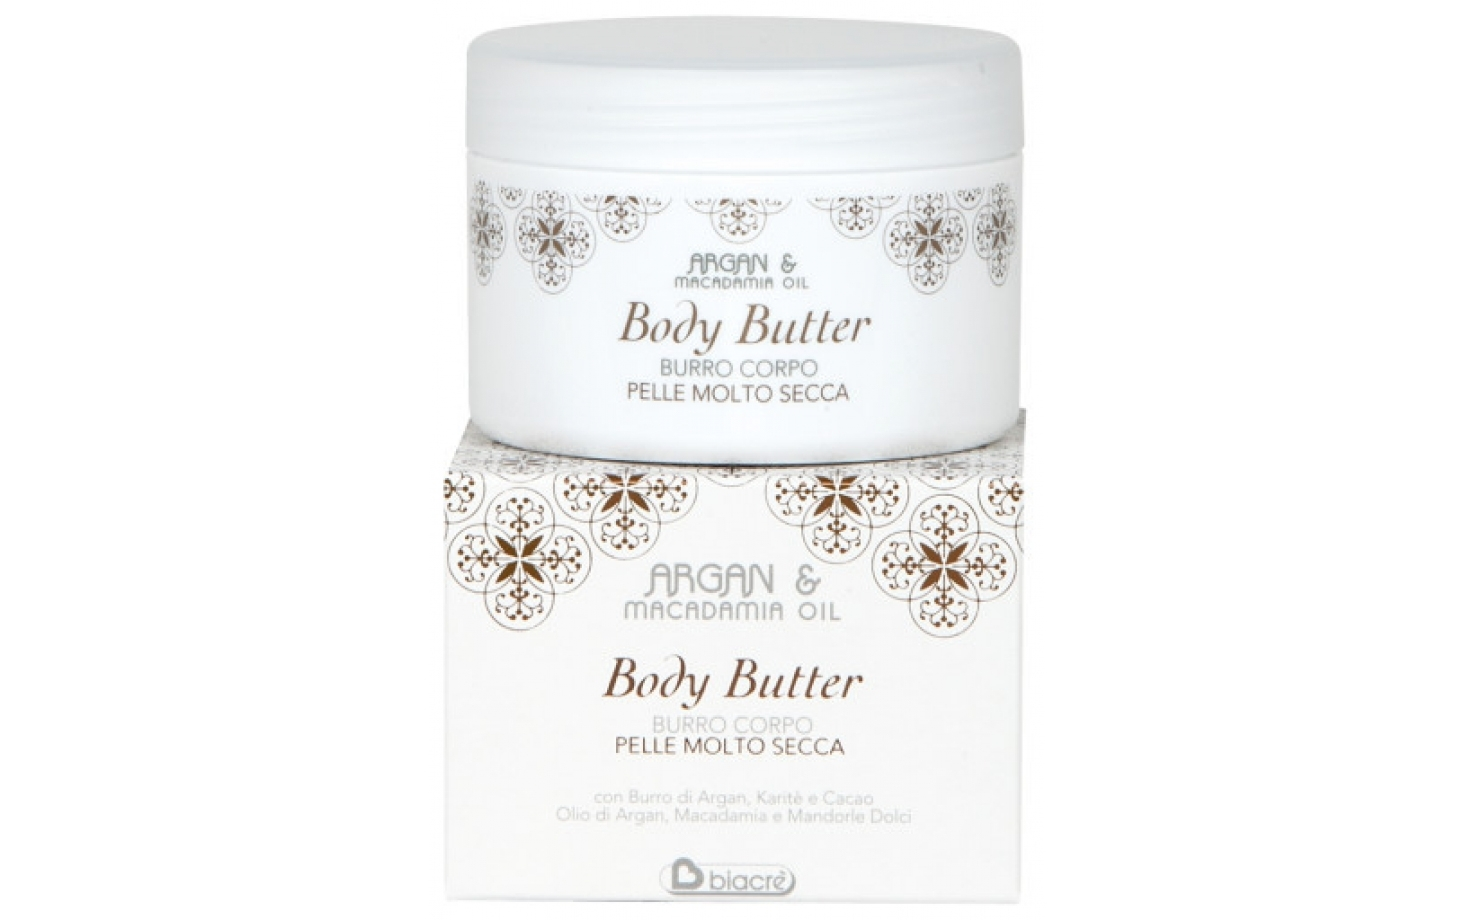 Biacre Argan & Macadamia Body Butter 250 ml